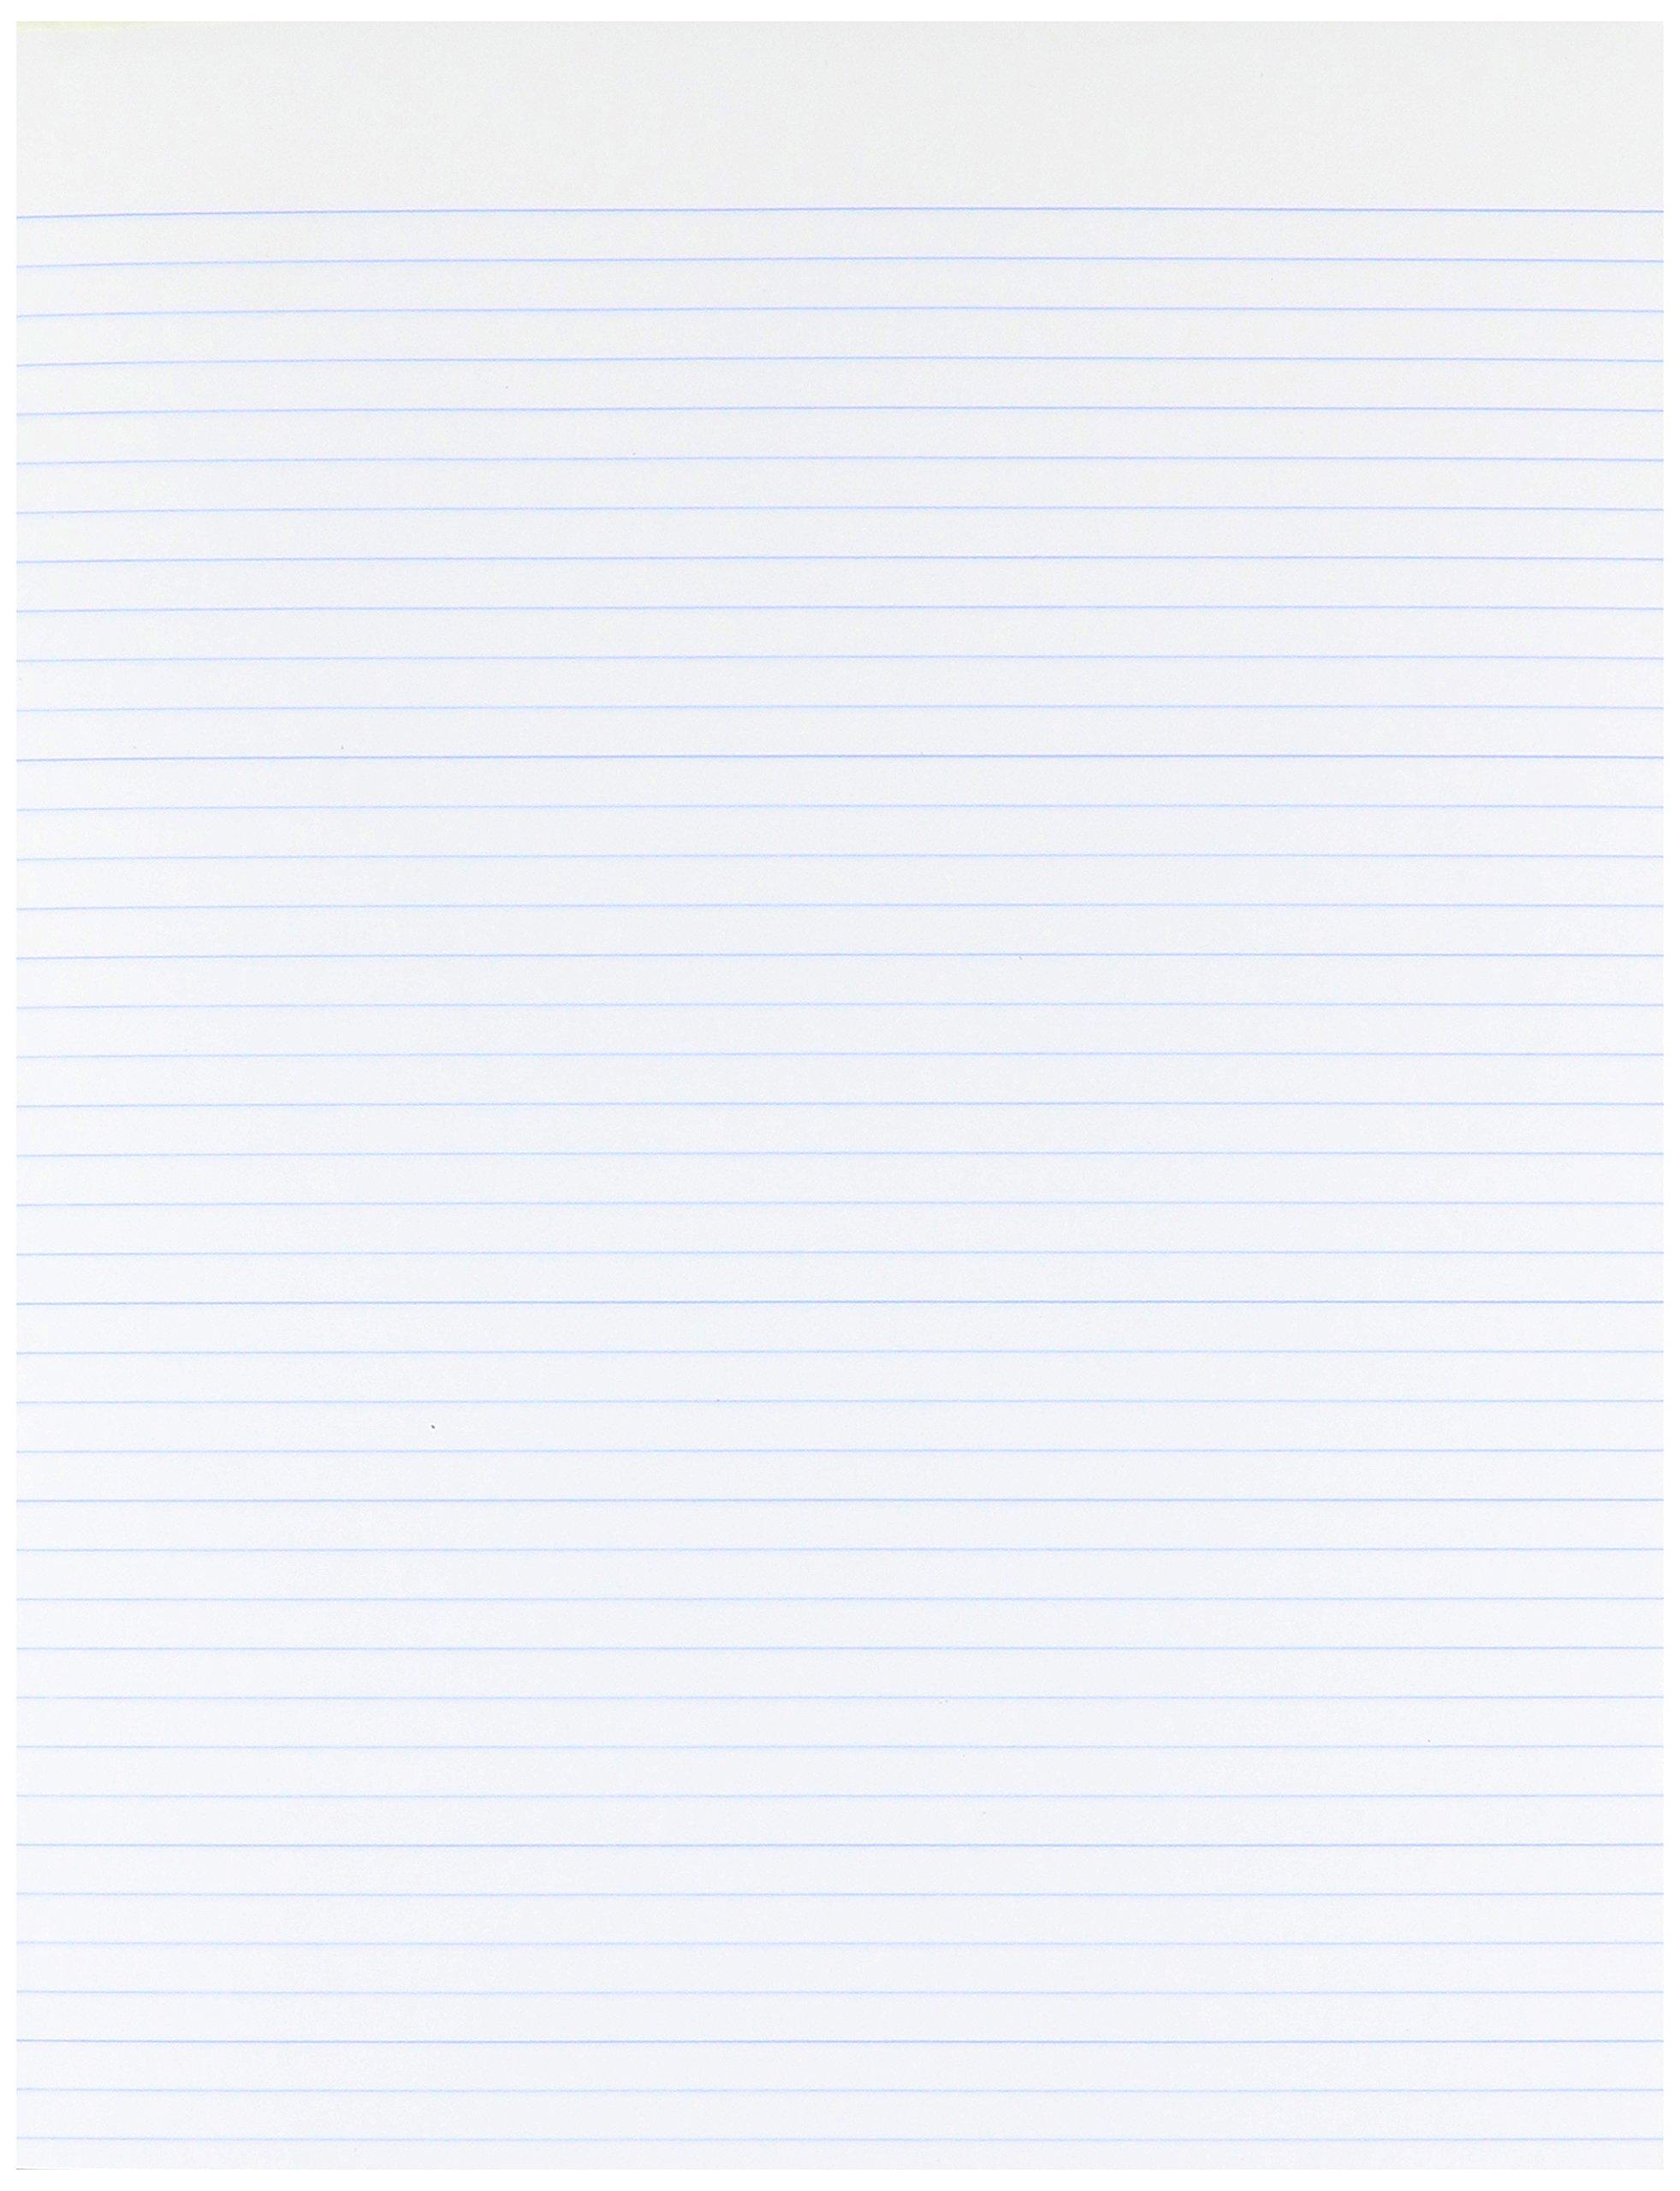 AMPAD Glue Top Pads, 8 1/2 x 11, White, 50 Sheets, Dozen (21118)